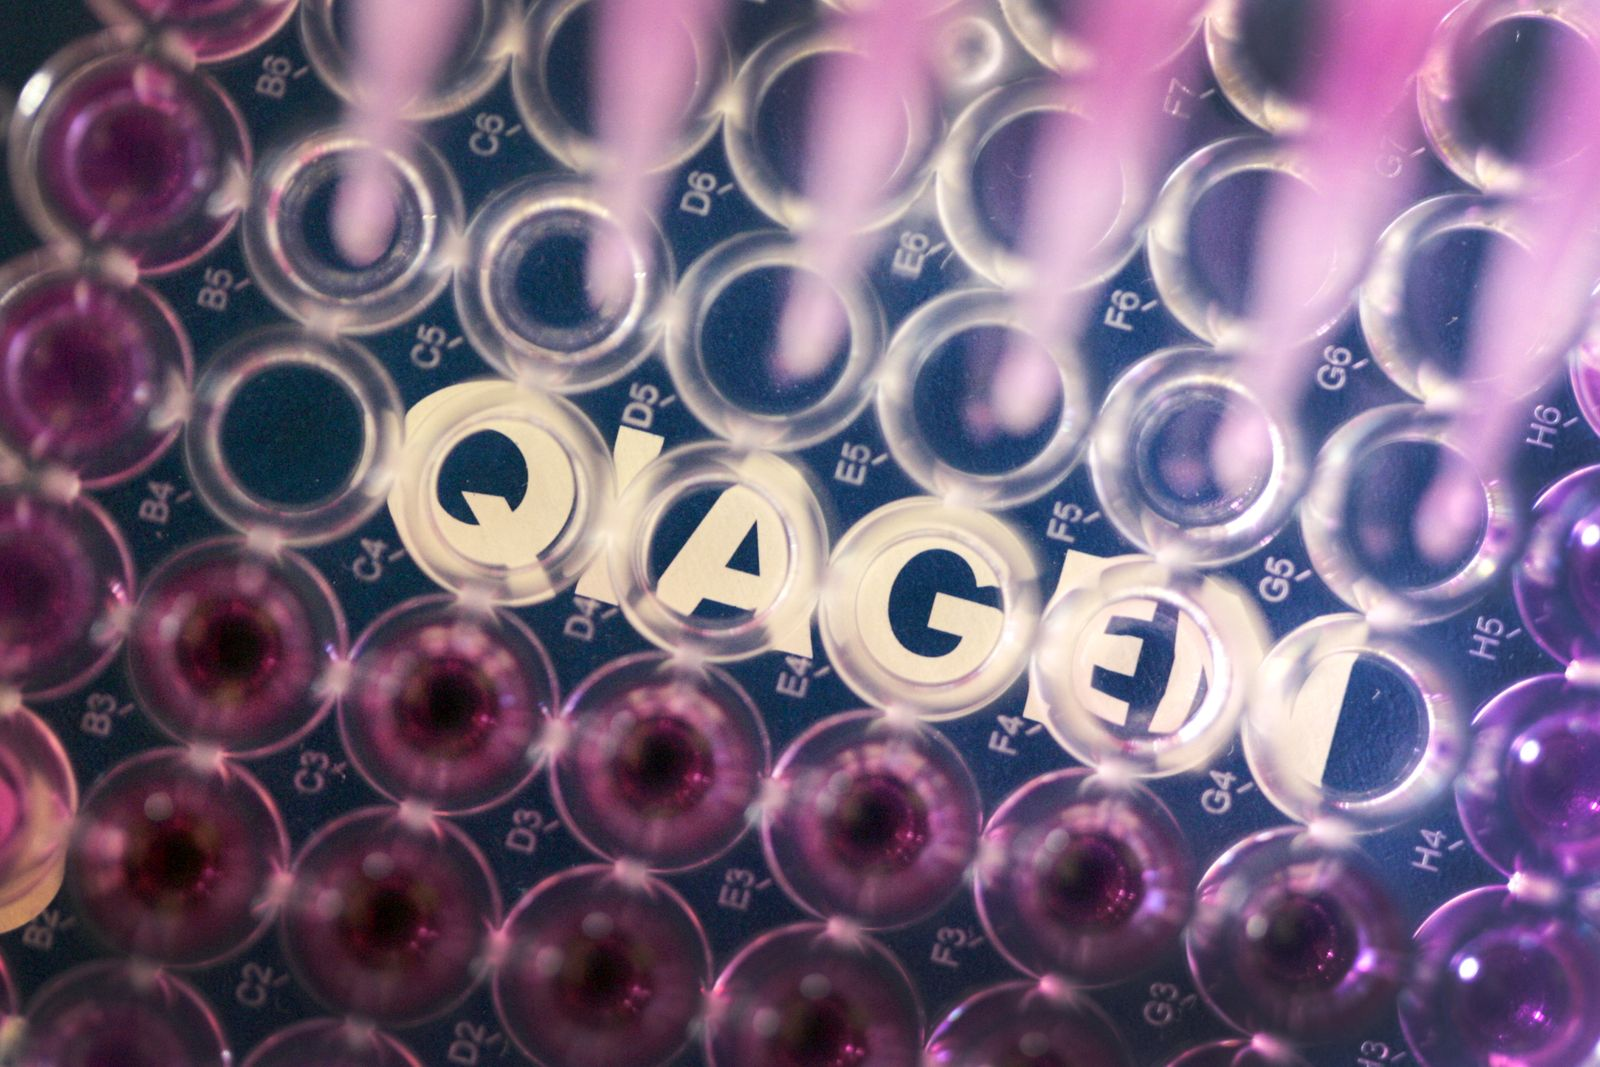 Biotechunternehmen Qiagen